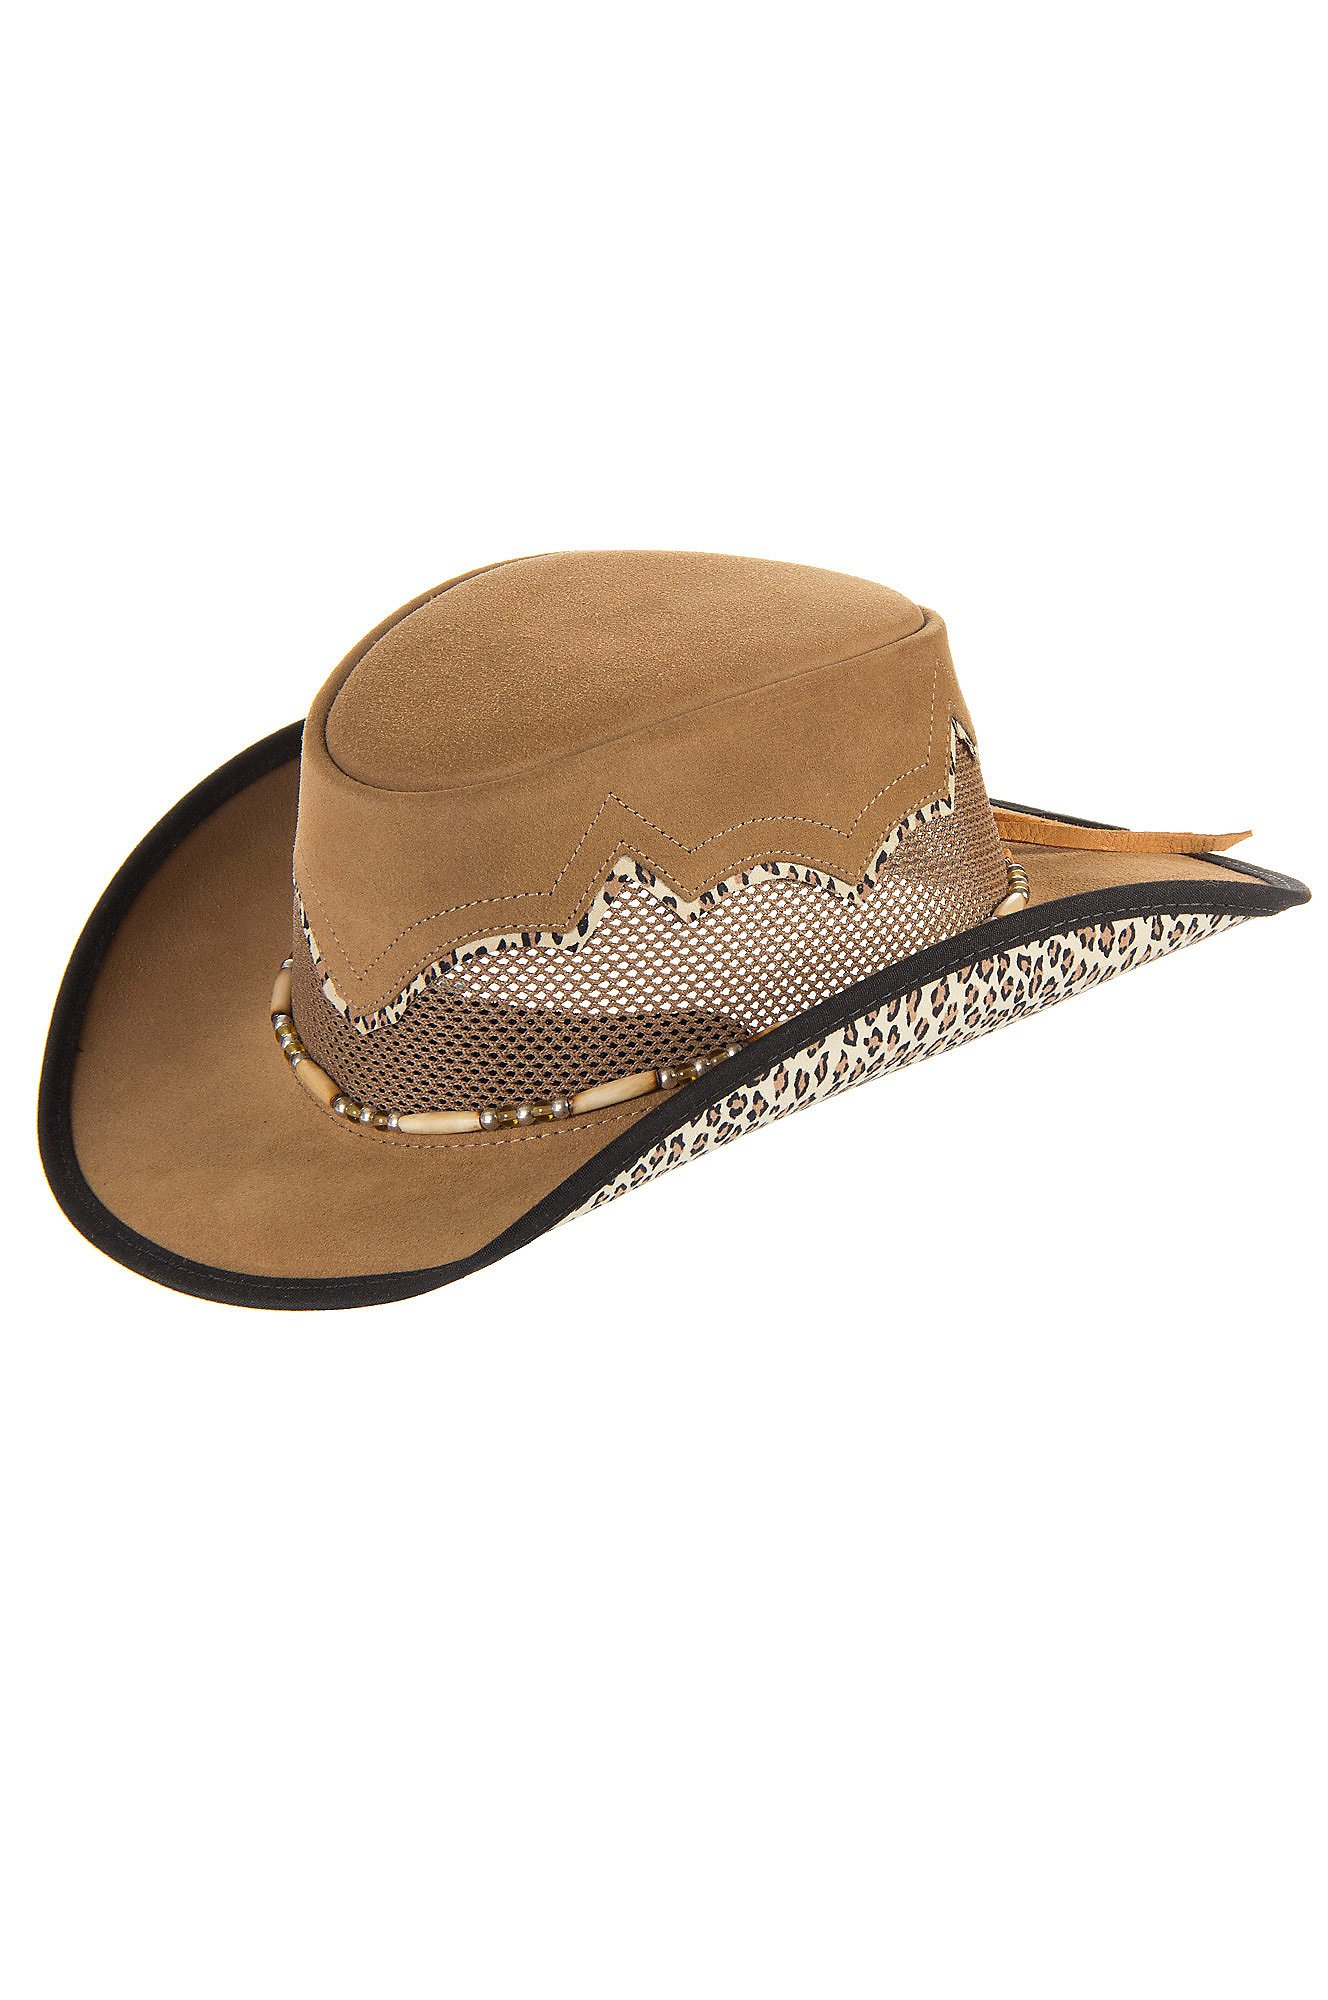 "Women's Sierra Suede Breezer Cowboy Hat, BEIGE/CREAM LEOPARD, Size S (21.5"" circumference) by Overland Sheepskin Co"